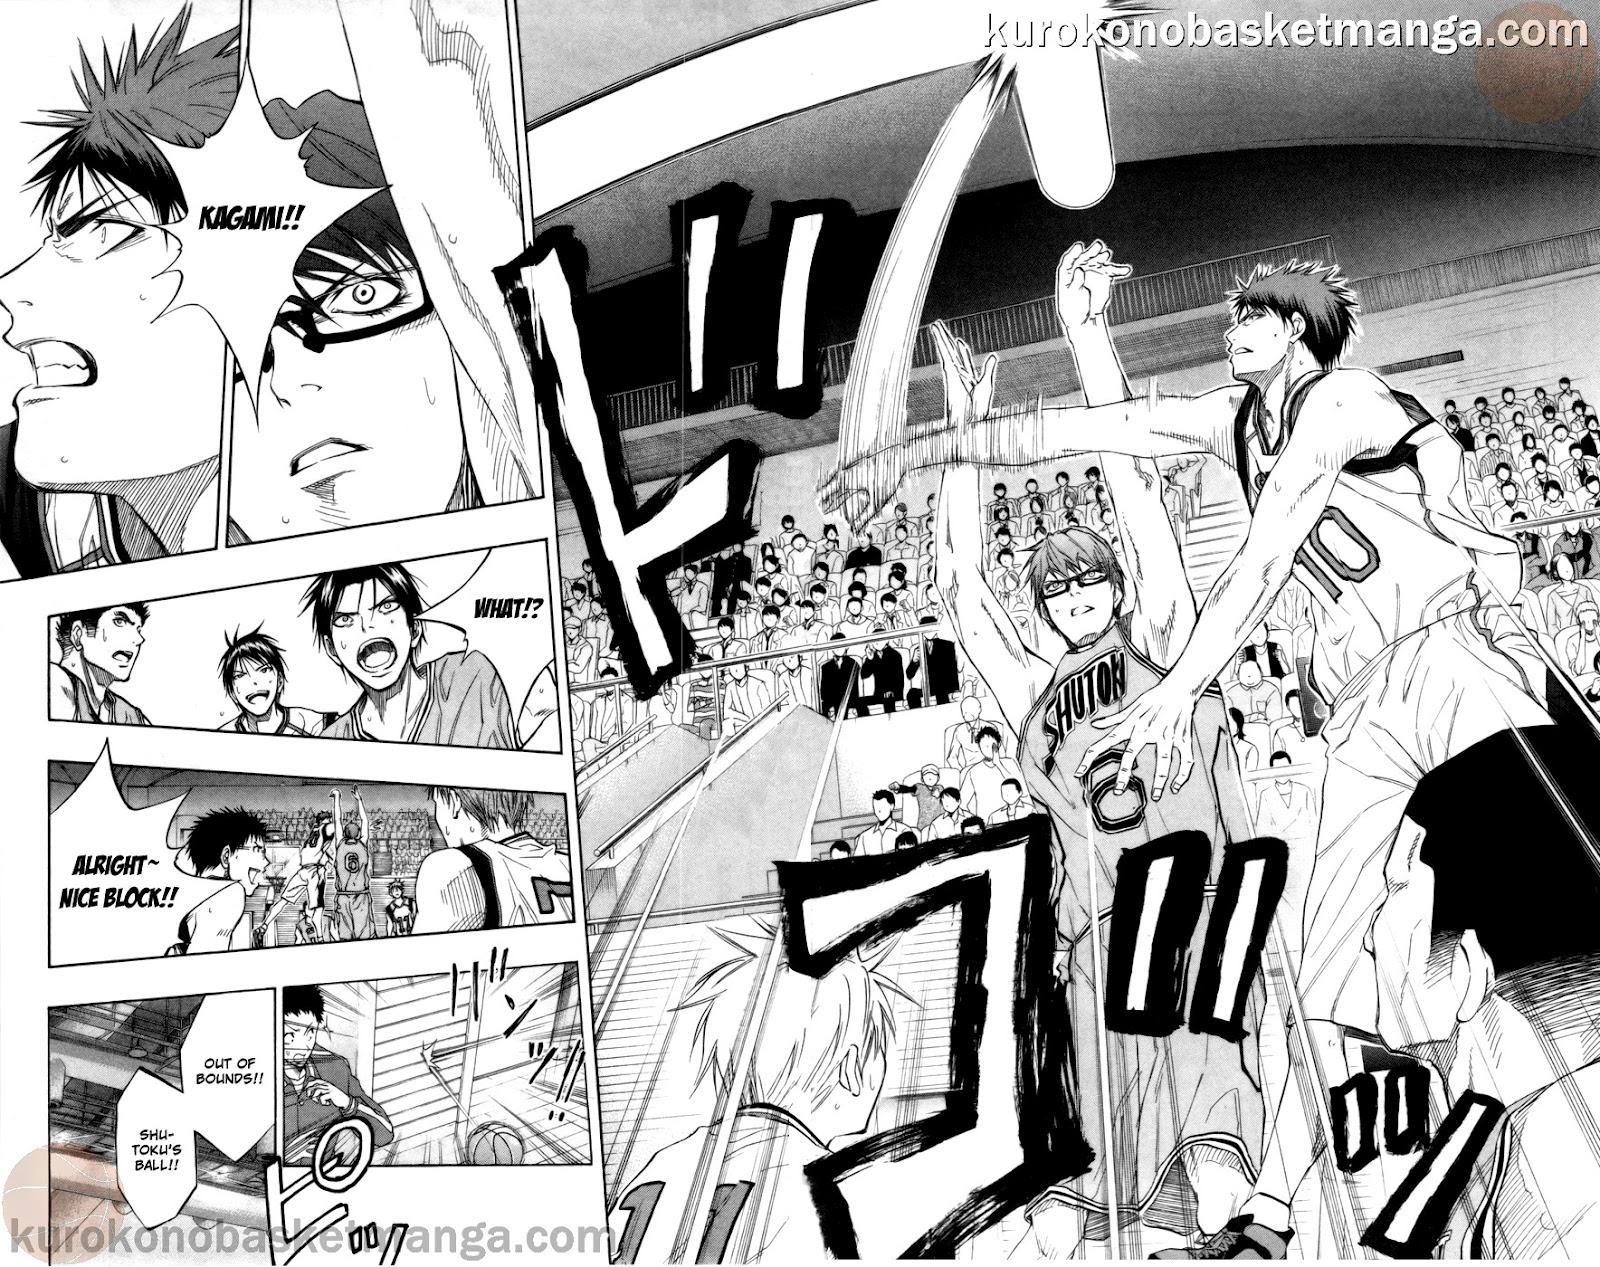 Kuroko no Basket Manga Chapter 86 - Image 12-13